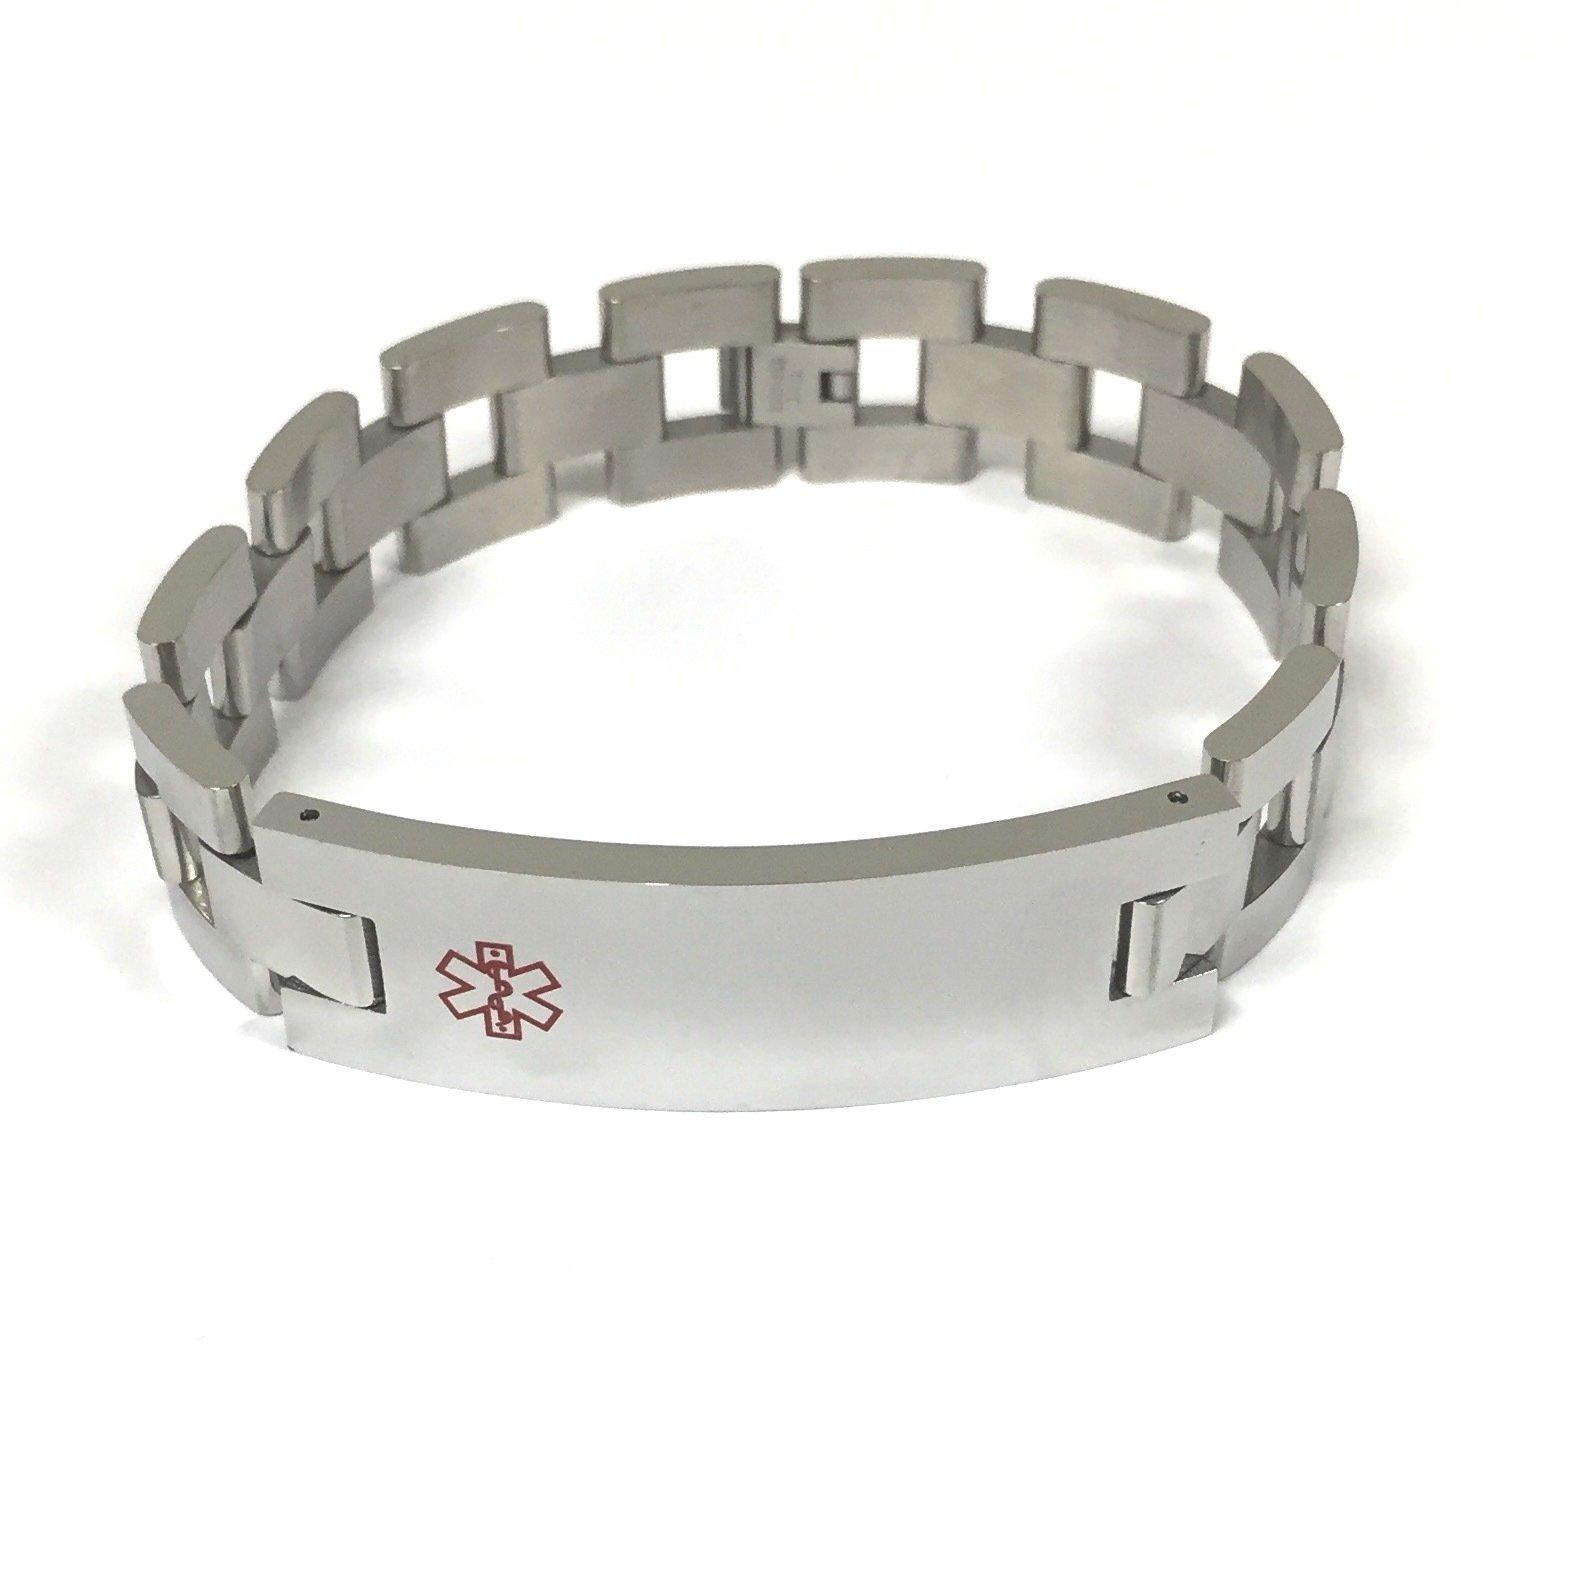 TravelJewelry.com Stainless Steel 9'' Medical Men's ID Bracelet by TravelJewelry.com (Image #1)